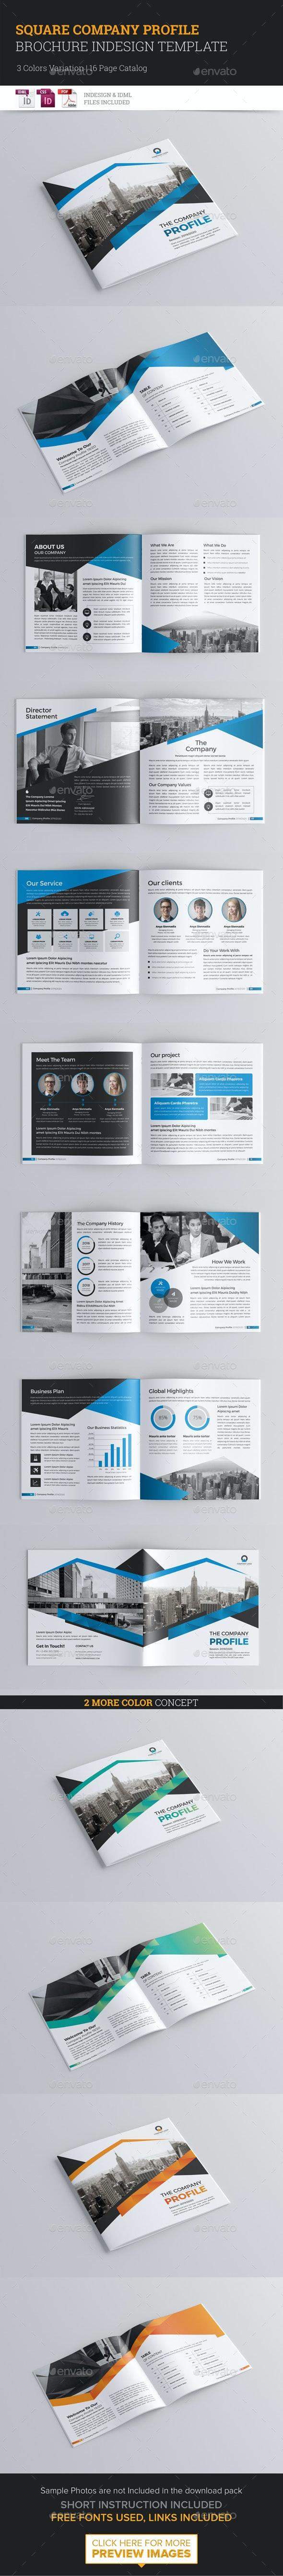 Square Brochure Template - Corporate Brochures